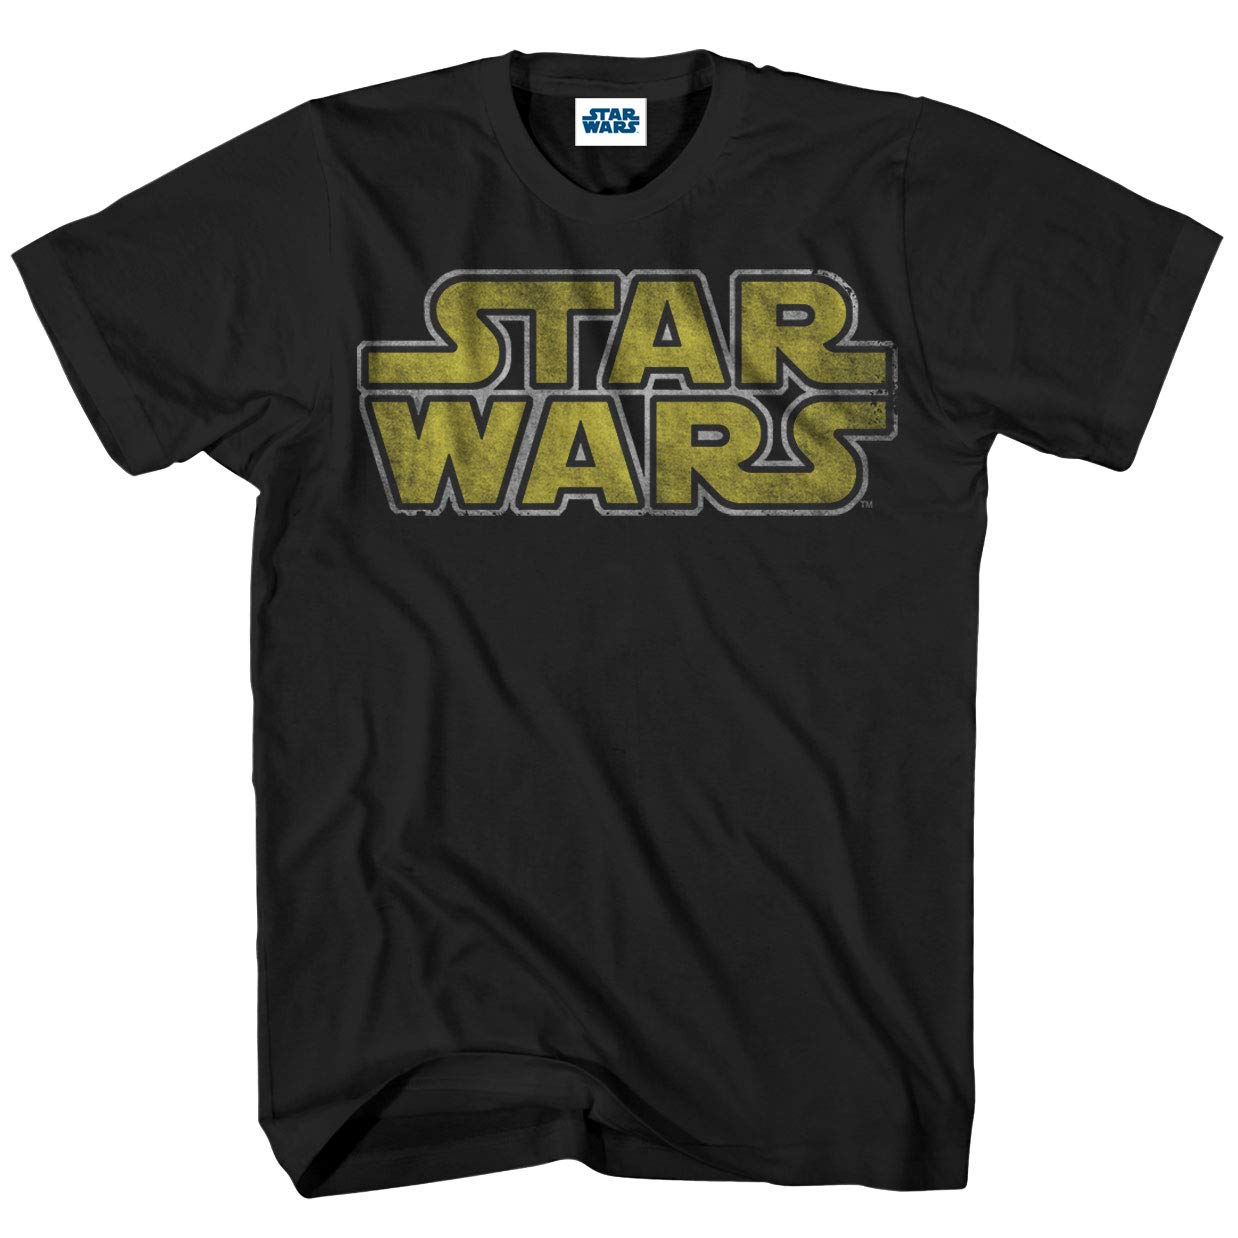 5329d417f5 Amazon.com: Star Wars Men's Classic Vintage Simple Logo T-Shirt: Clothing